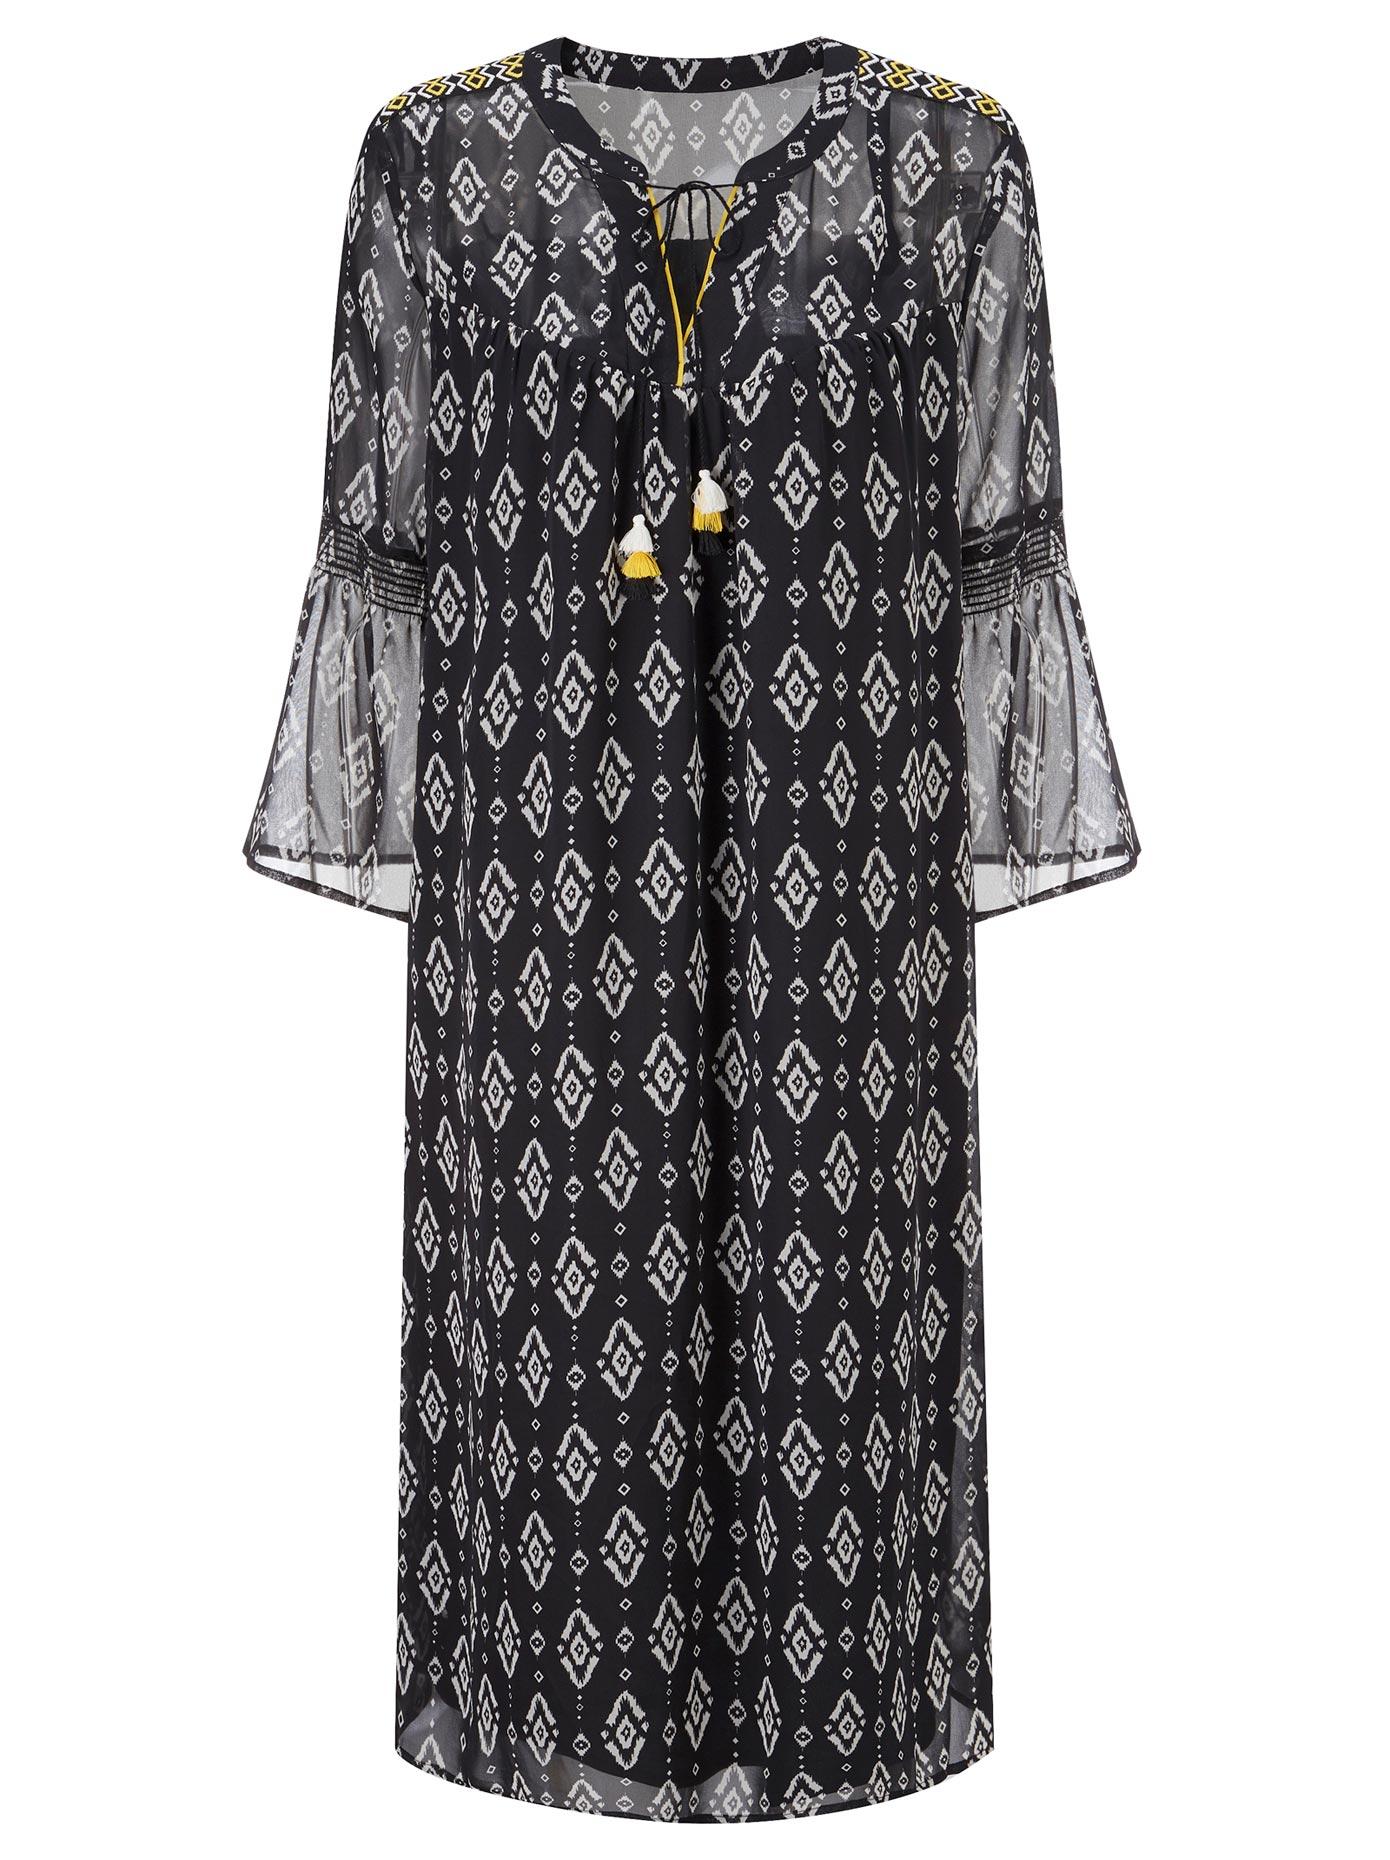 Image of Classic Inspirationen Kleid in duftiger Chiffon-Qualität